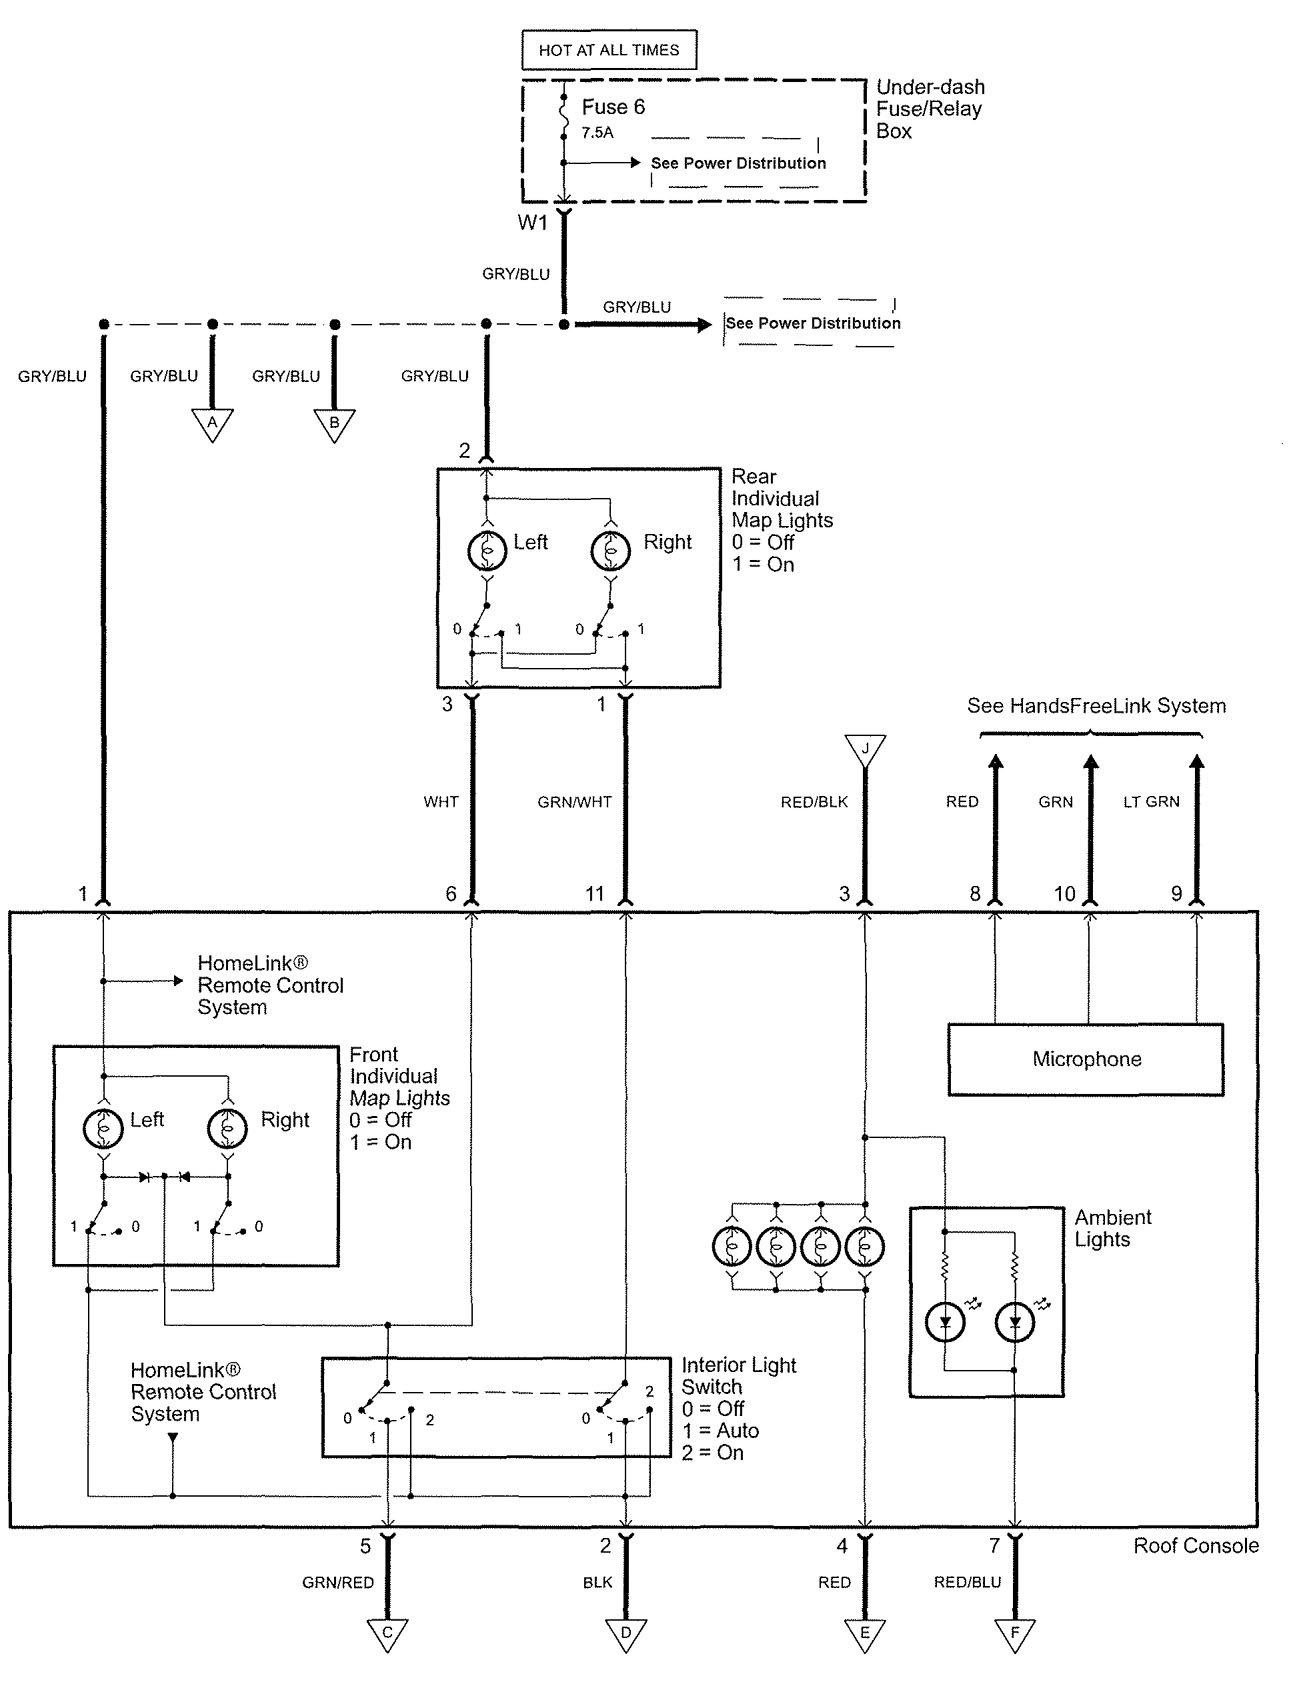 Audi A4 Interior Light Wiring Diagram - Overhead Dvd Player Wiring Diagram  For Gm for Wiring Diagram Schematics | Audi A4 Interior Light Wiring Diagram |  | Wiring Diagram Schematics